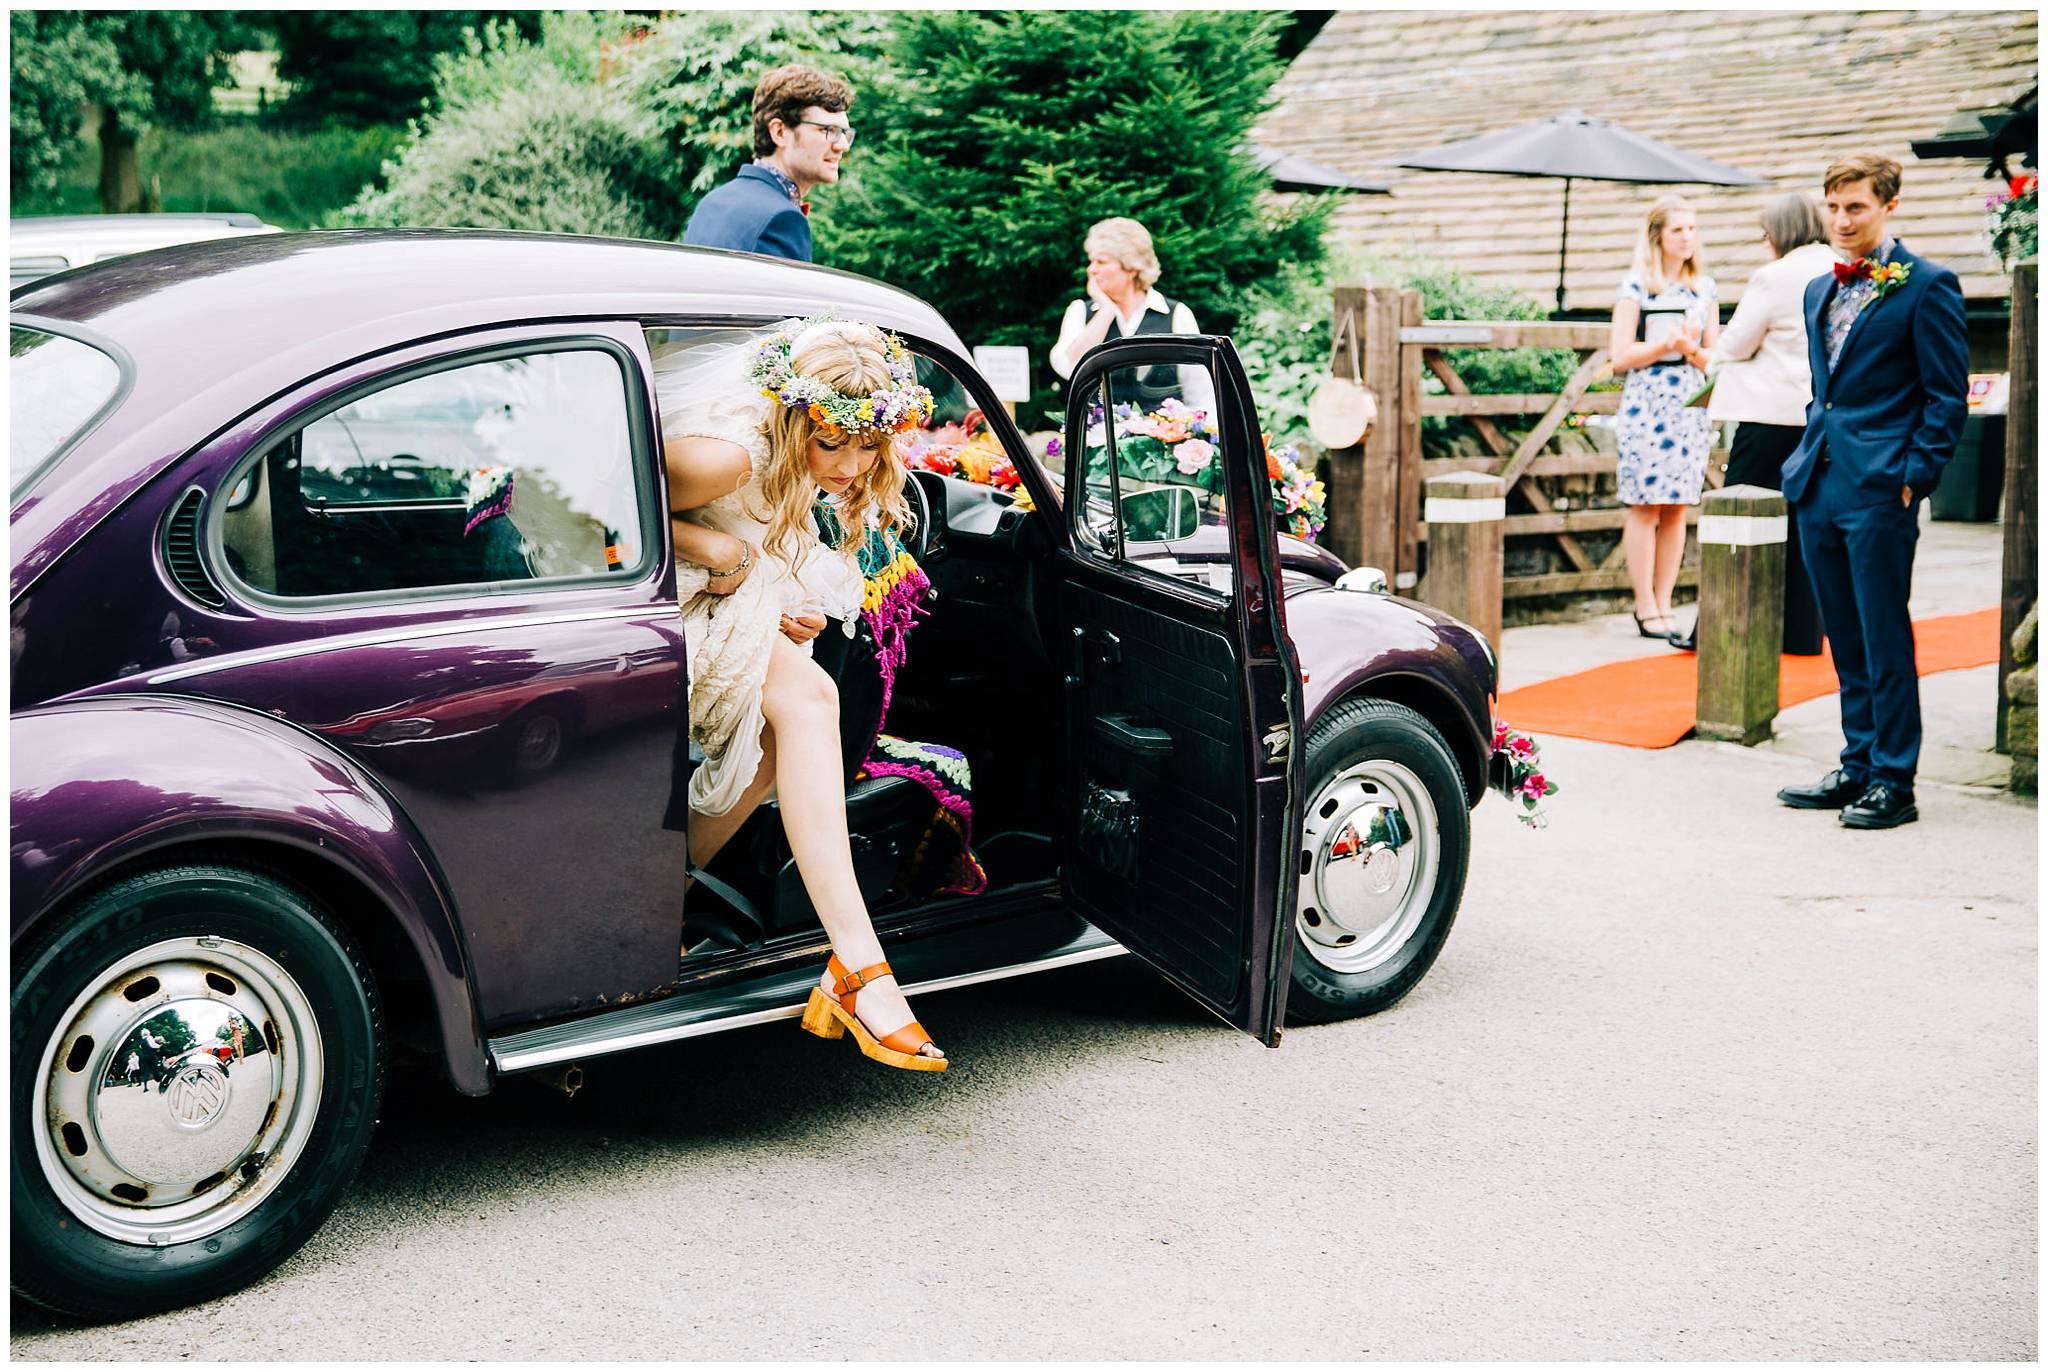 bride steps out of vintage purple VW beetle